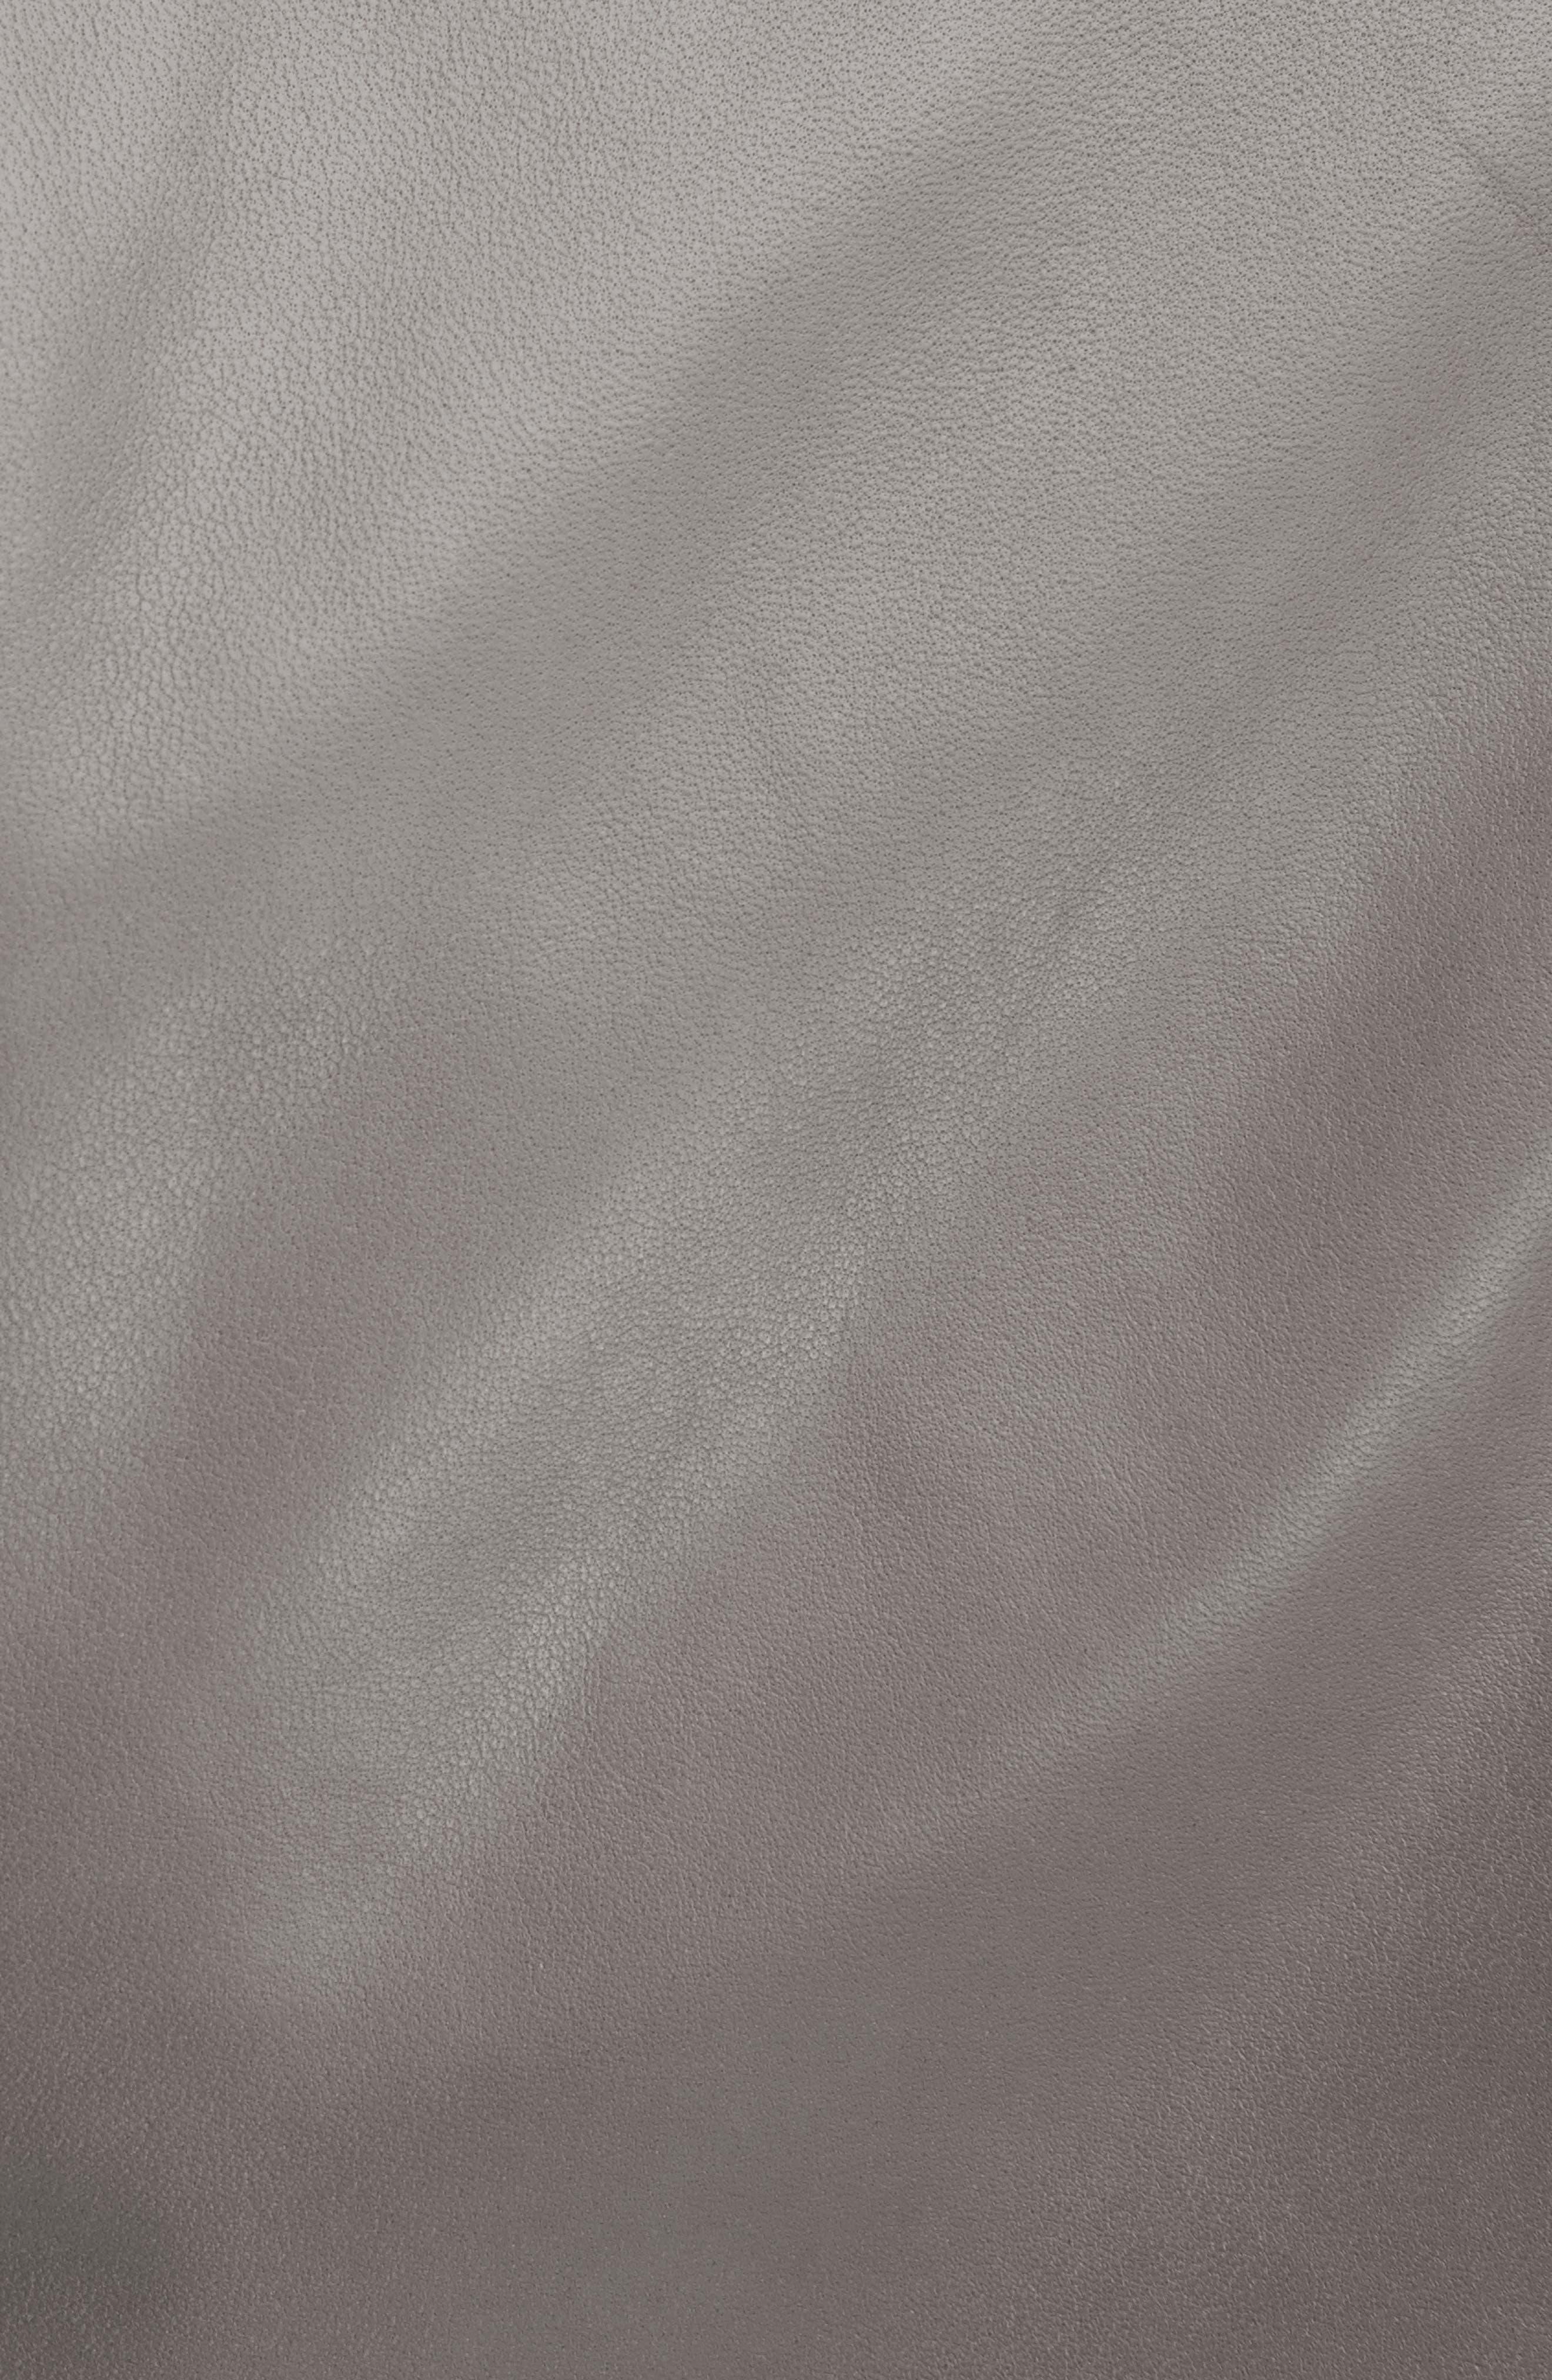 Alternate Image 3  - Rick Owens Classic Stooges Leather Jacket